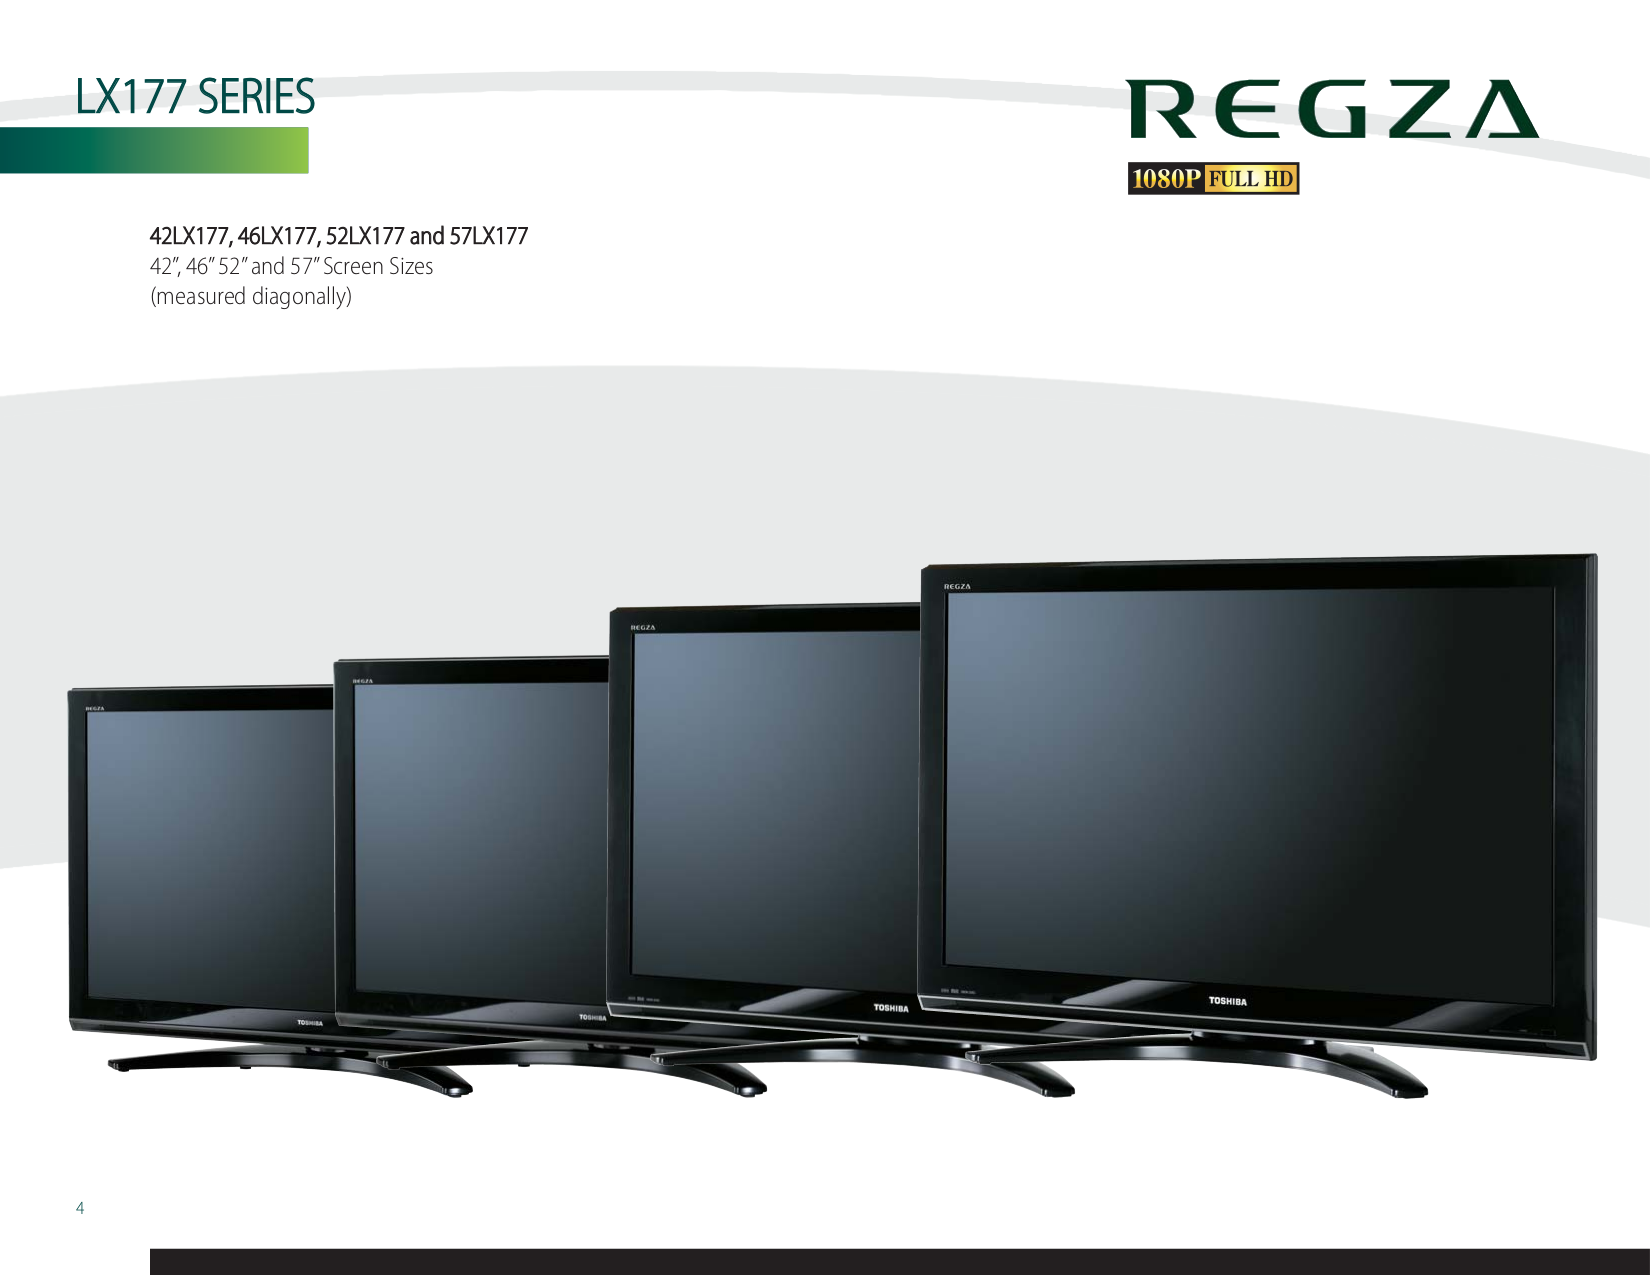 pdf manual for toshiba tv regza 42lx177 rh umlib com Toshiba LCD REGZA Manual Toshiba Flat Screen TV Manual